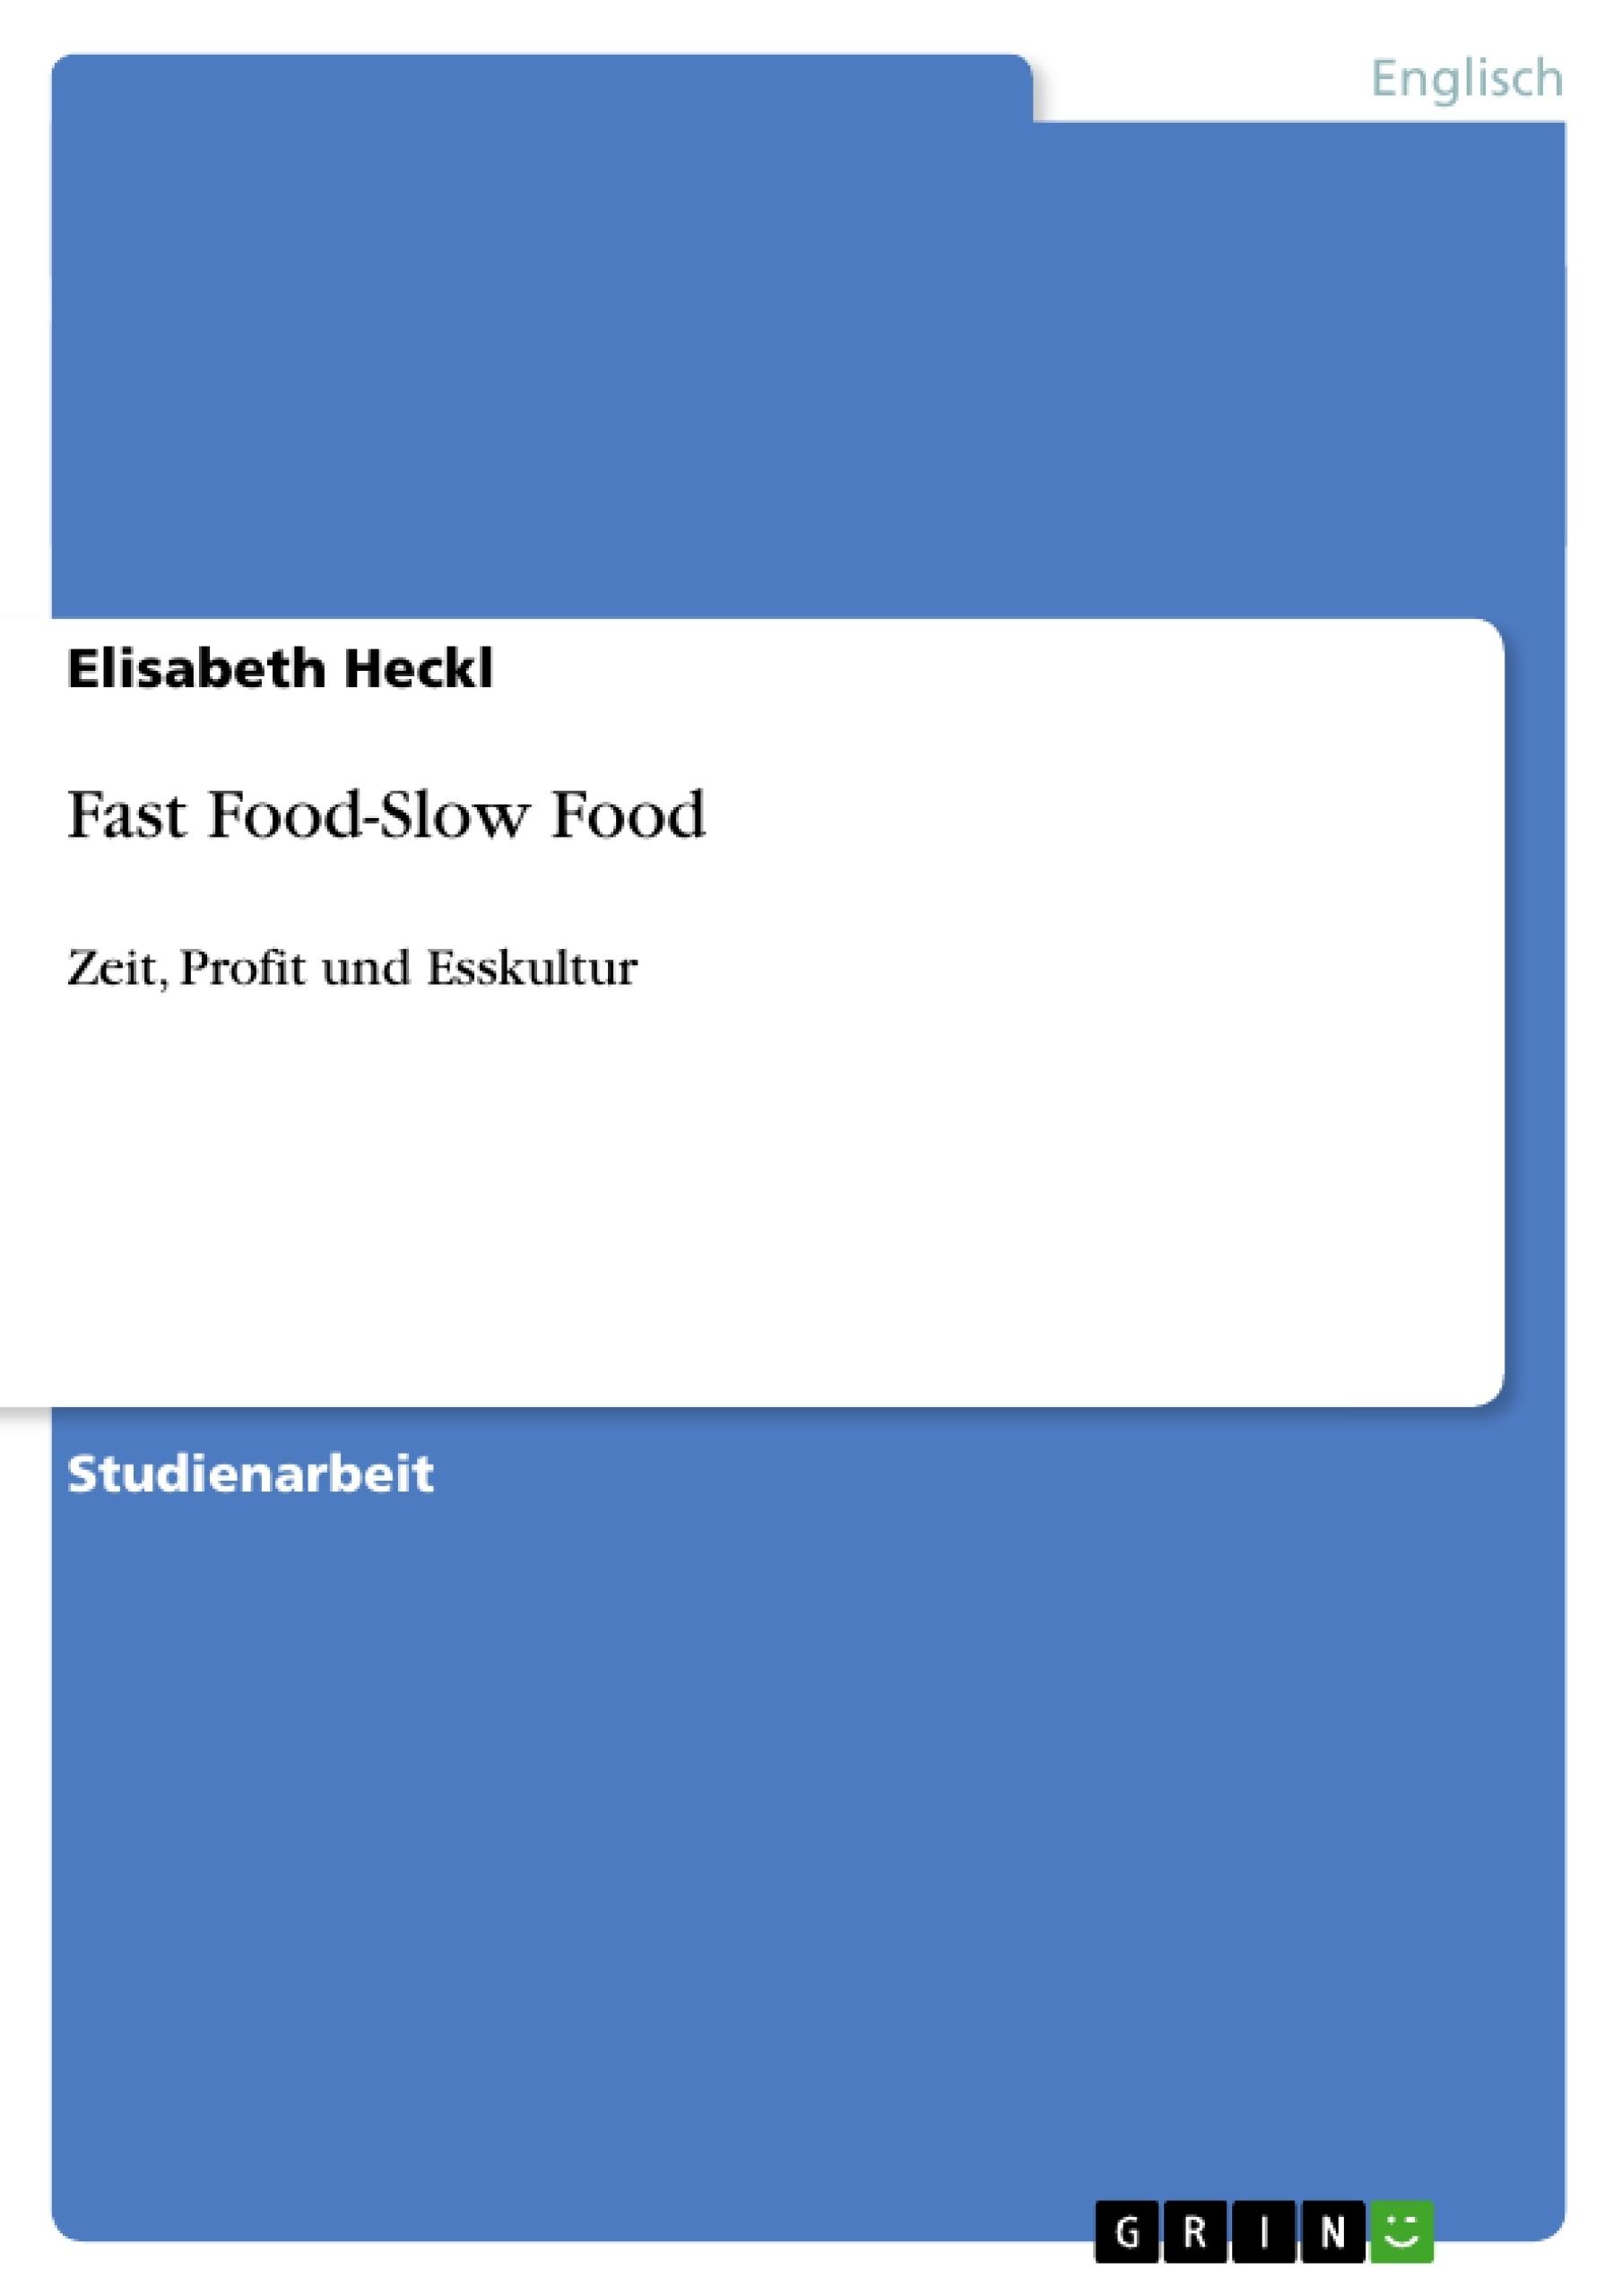 Titel: Fast Food-Slow Food